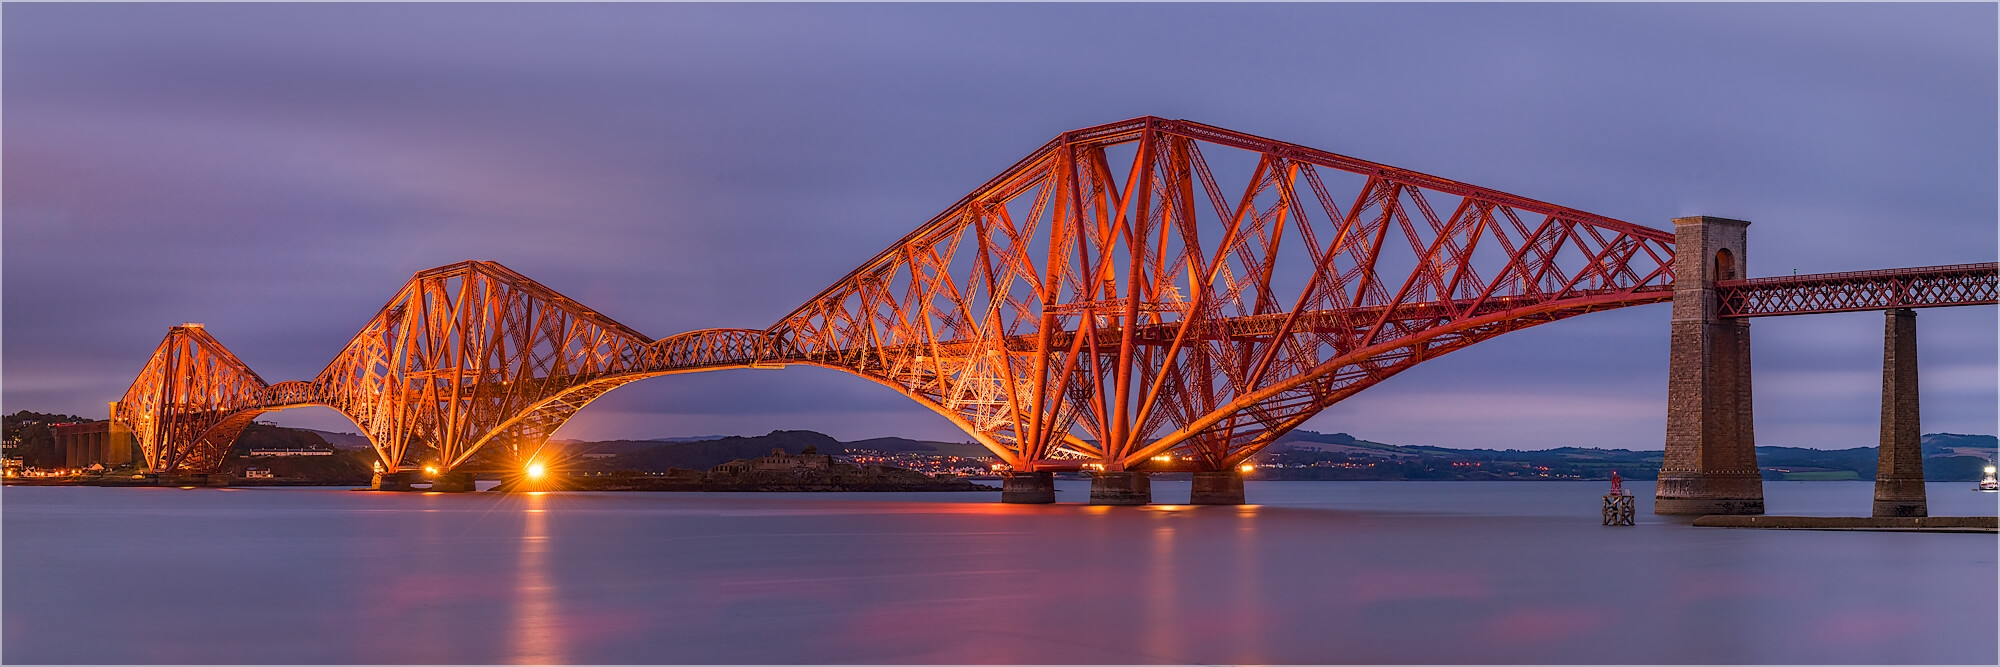 Panoramabild Edinburg Firth of Forth Railway Bridge